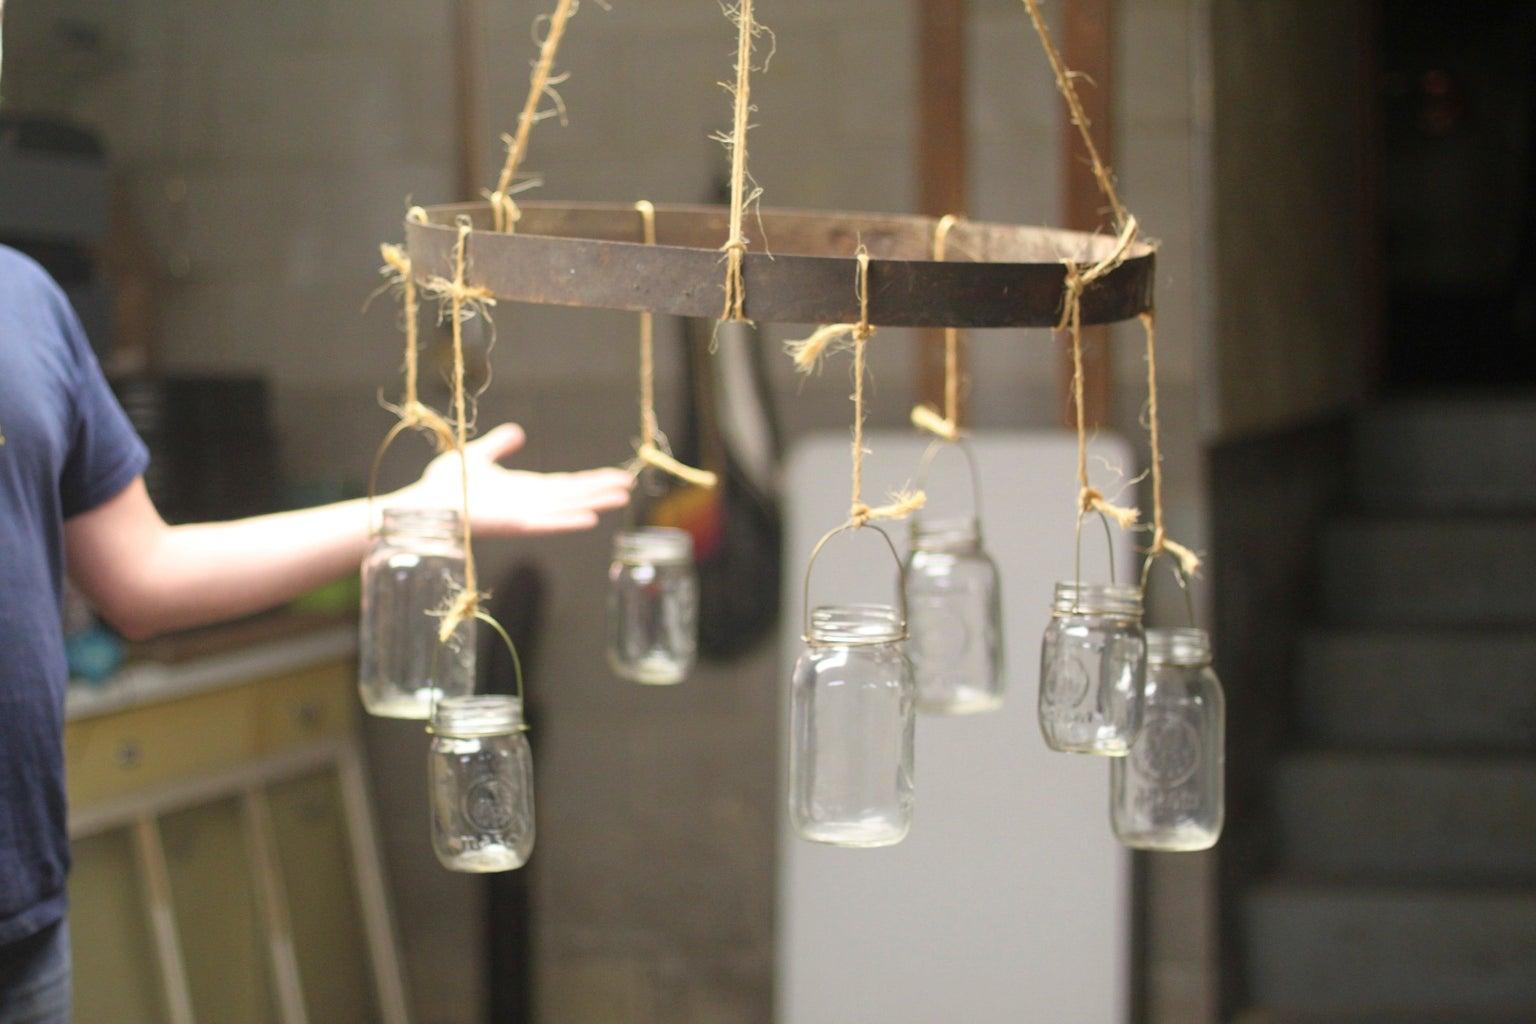 Hanging the Jars